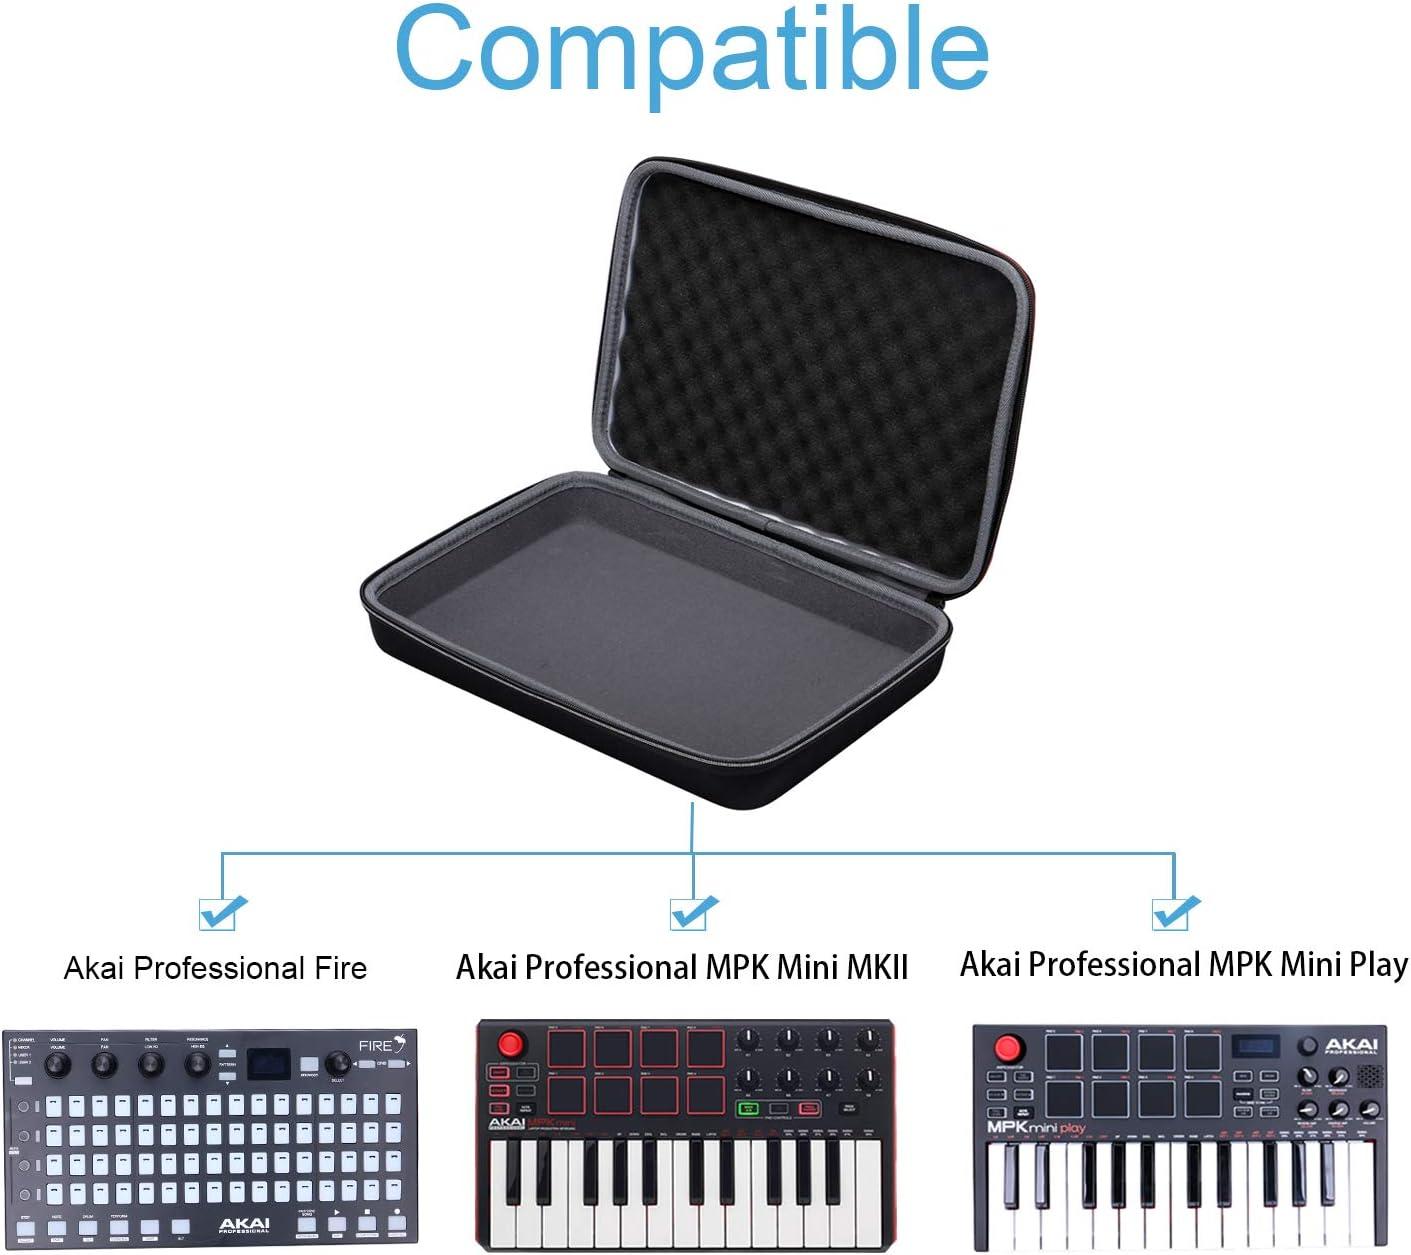 case only Khanka Hard Case for Akai Professional Fire Performance MIDI Keyboard Controller.